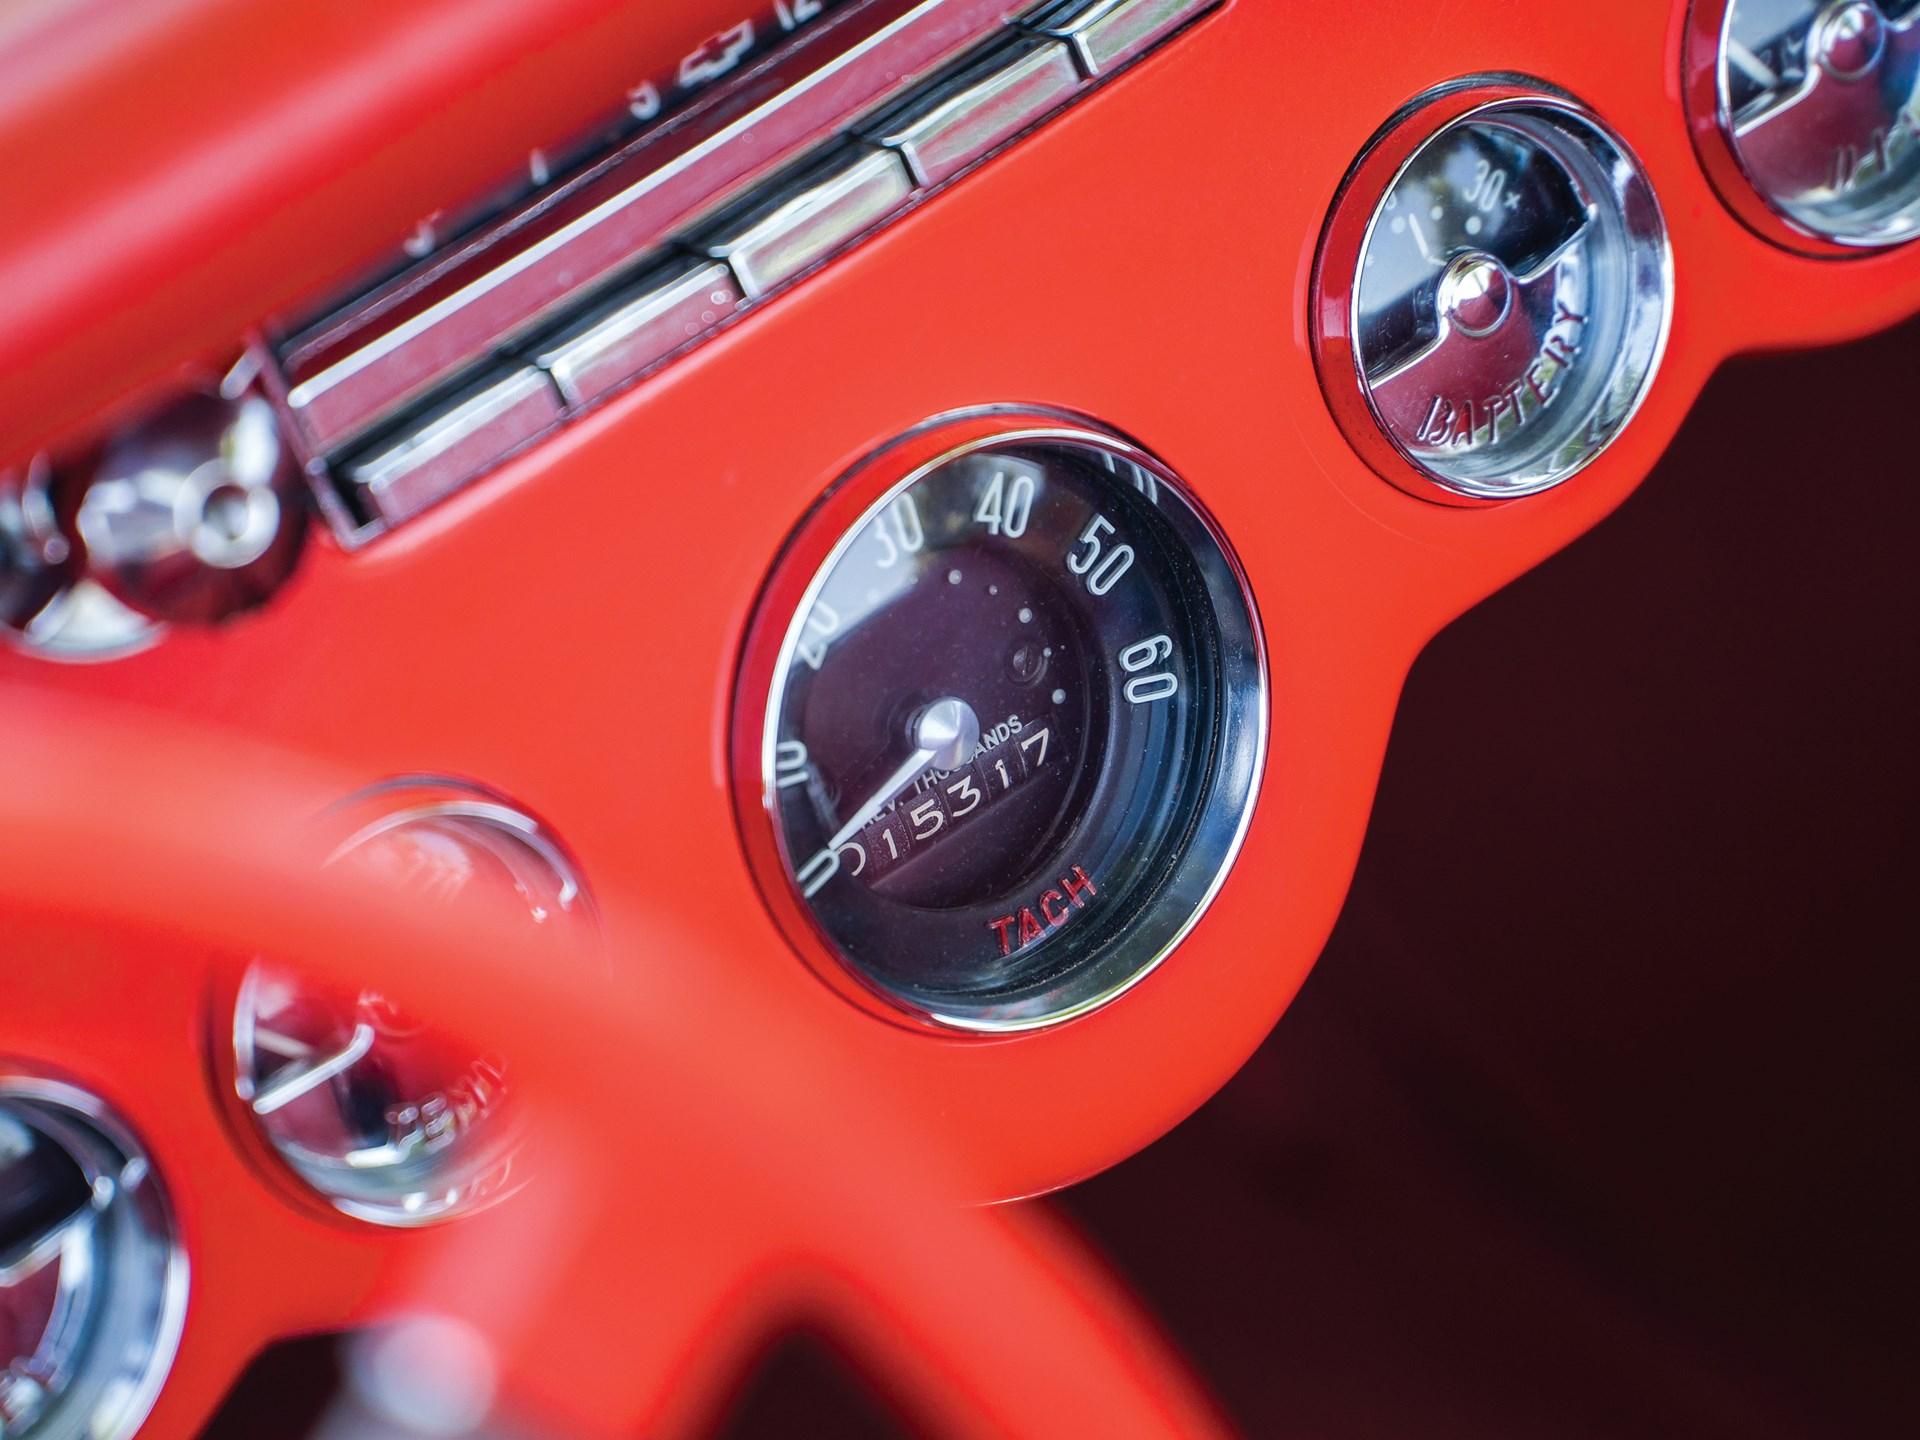 1957 Chevrolet Corvette 'Fuel-Injected' 283/283